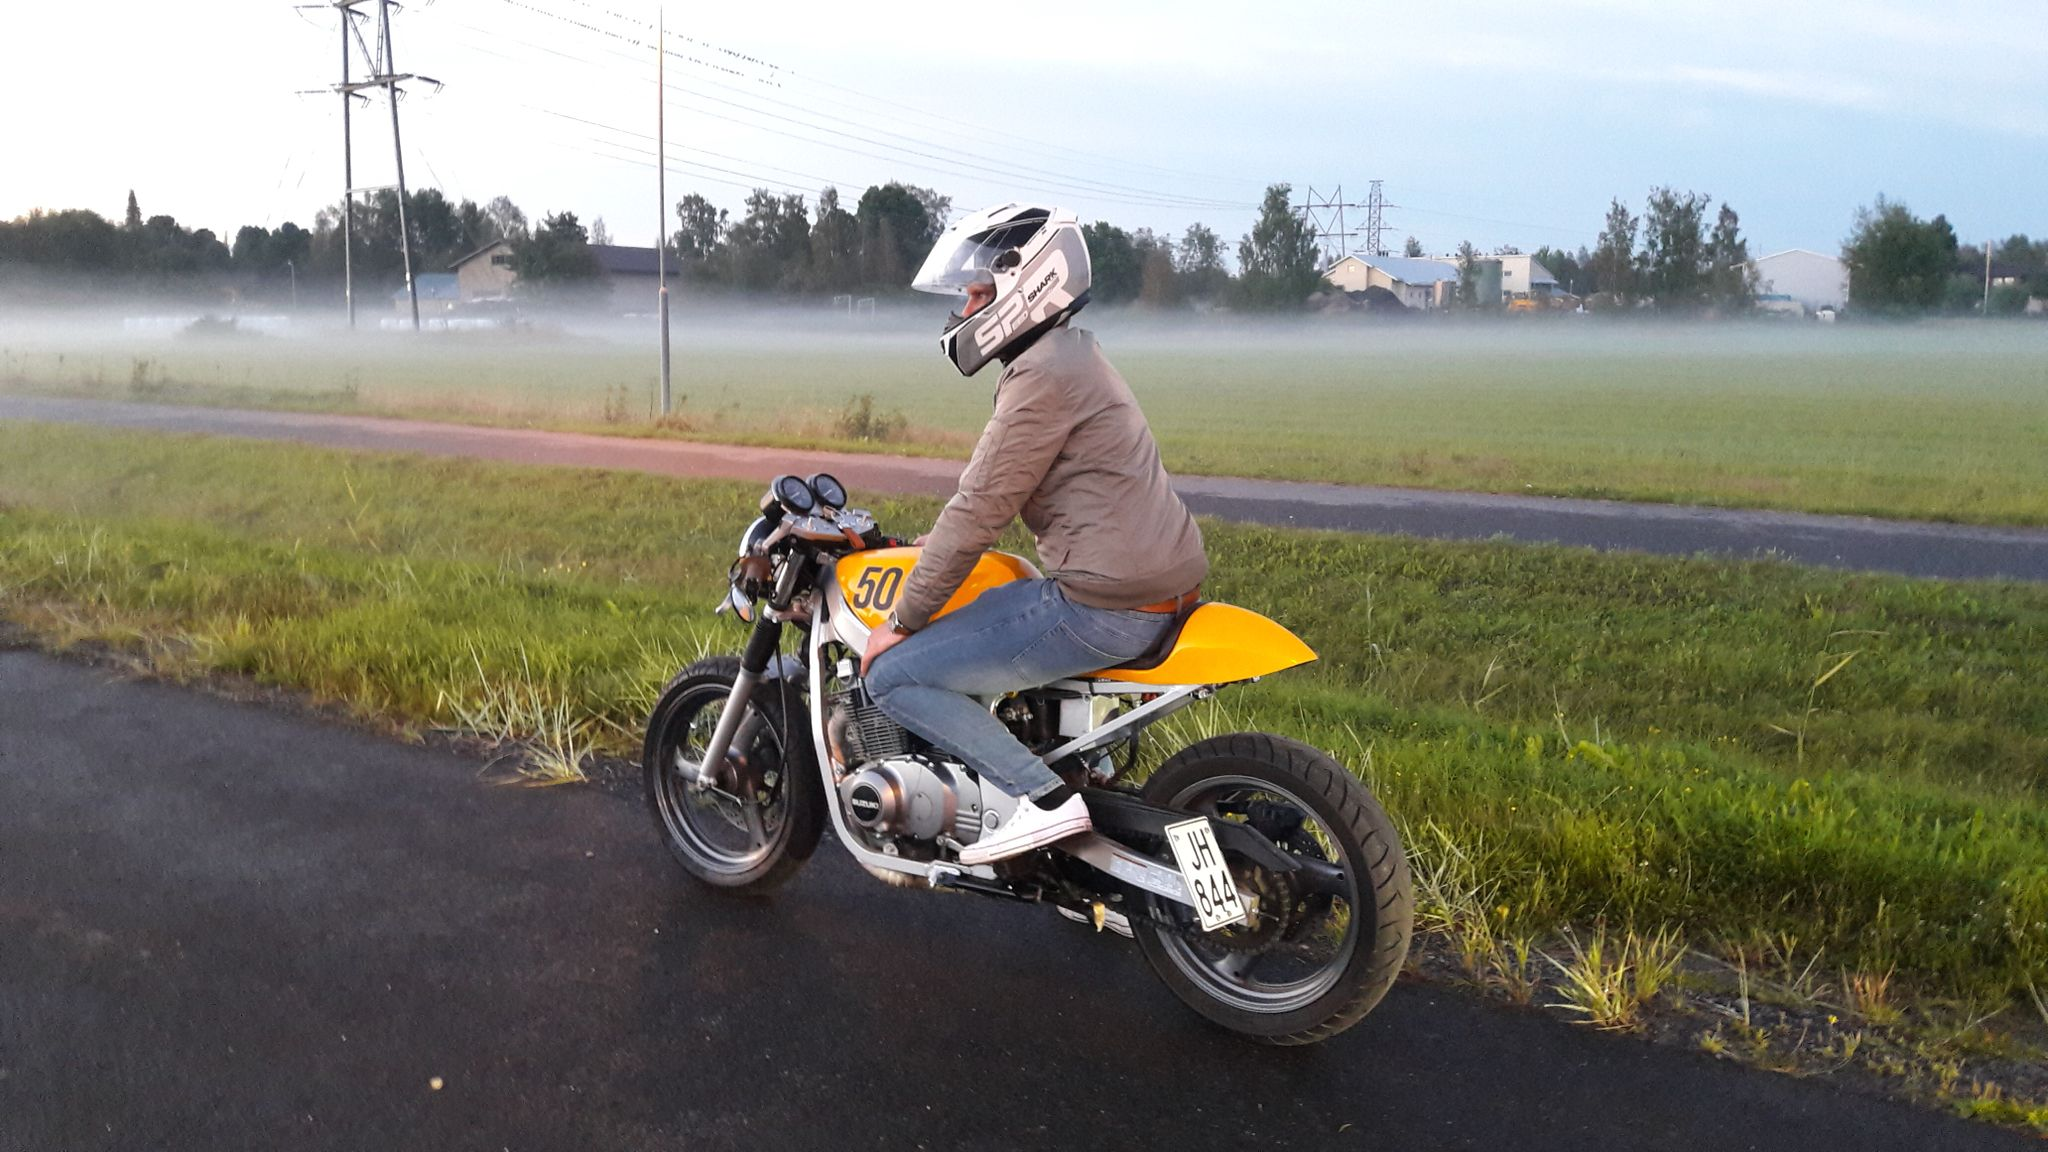 suzuki gs 500 e cafe racer suzuki gs 500 pinterest motos. Black Bedroom Furniture Sets. Home Design Ideas